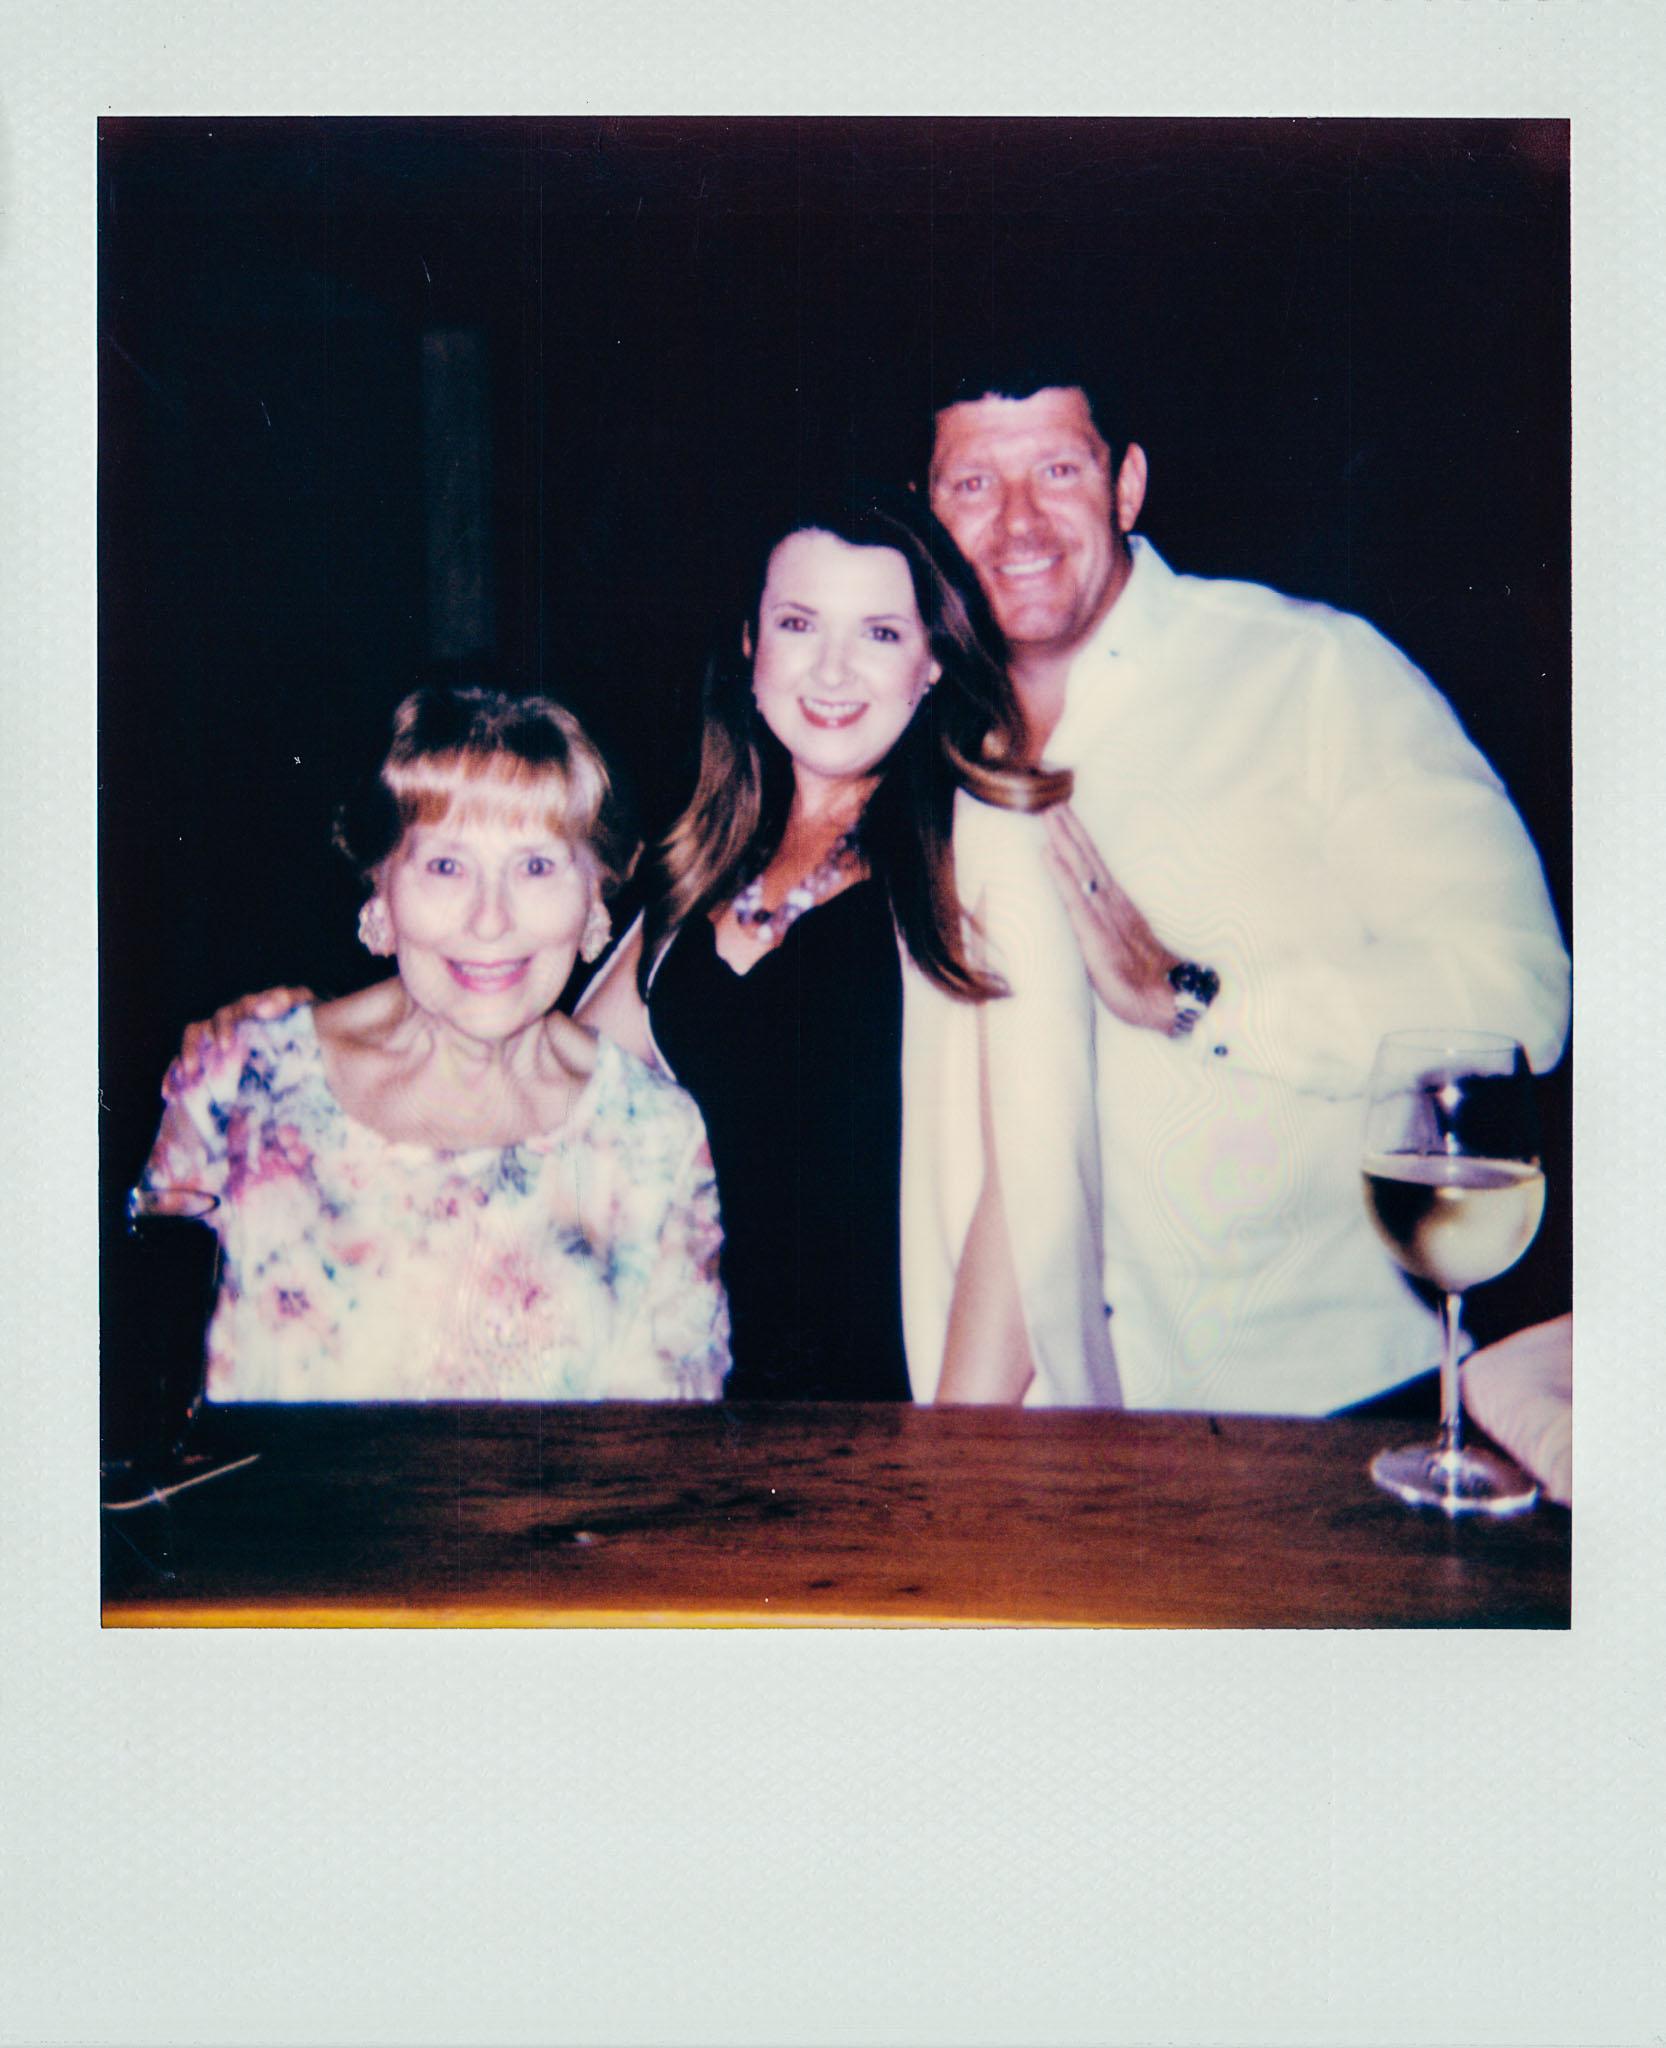 Linda Updike and Lauren Ferriola with a friend at Wallys Mills Avenue Liquors